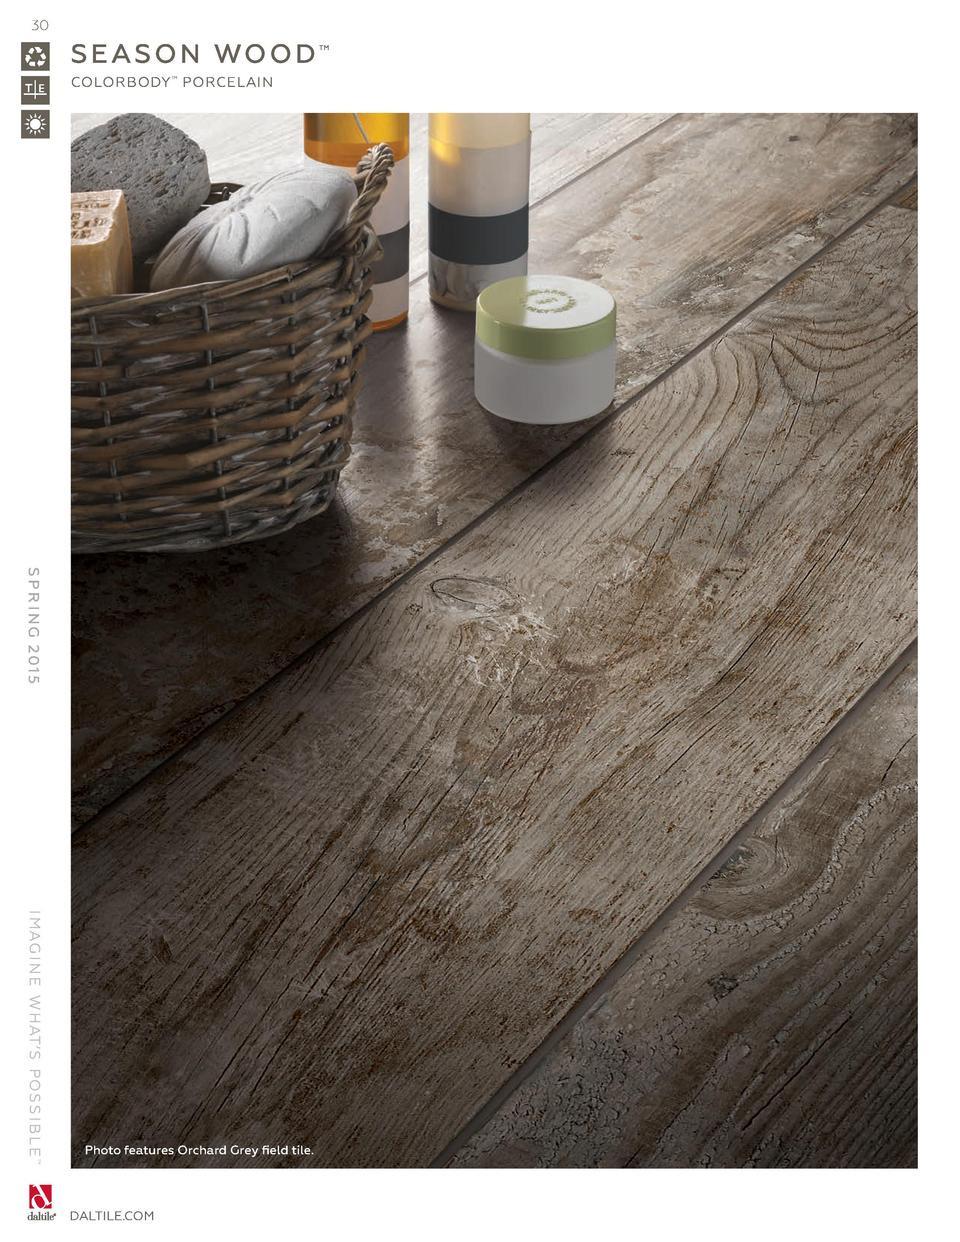 absolute hardwood flooring edmonton of daltile spring 2015 catalog simplebooklet com for 30 s e a s o n wo o d colorbody porcelain s p r i n g 2 01 5 i mag i n e w hat s po